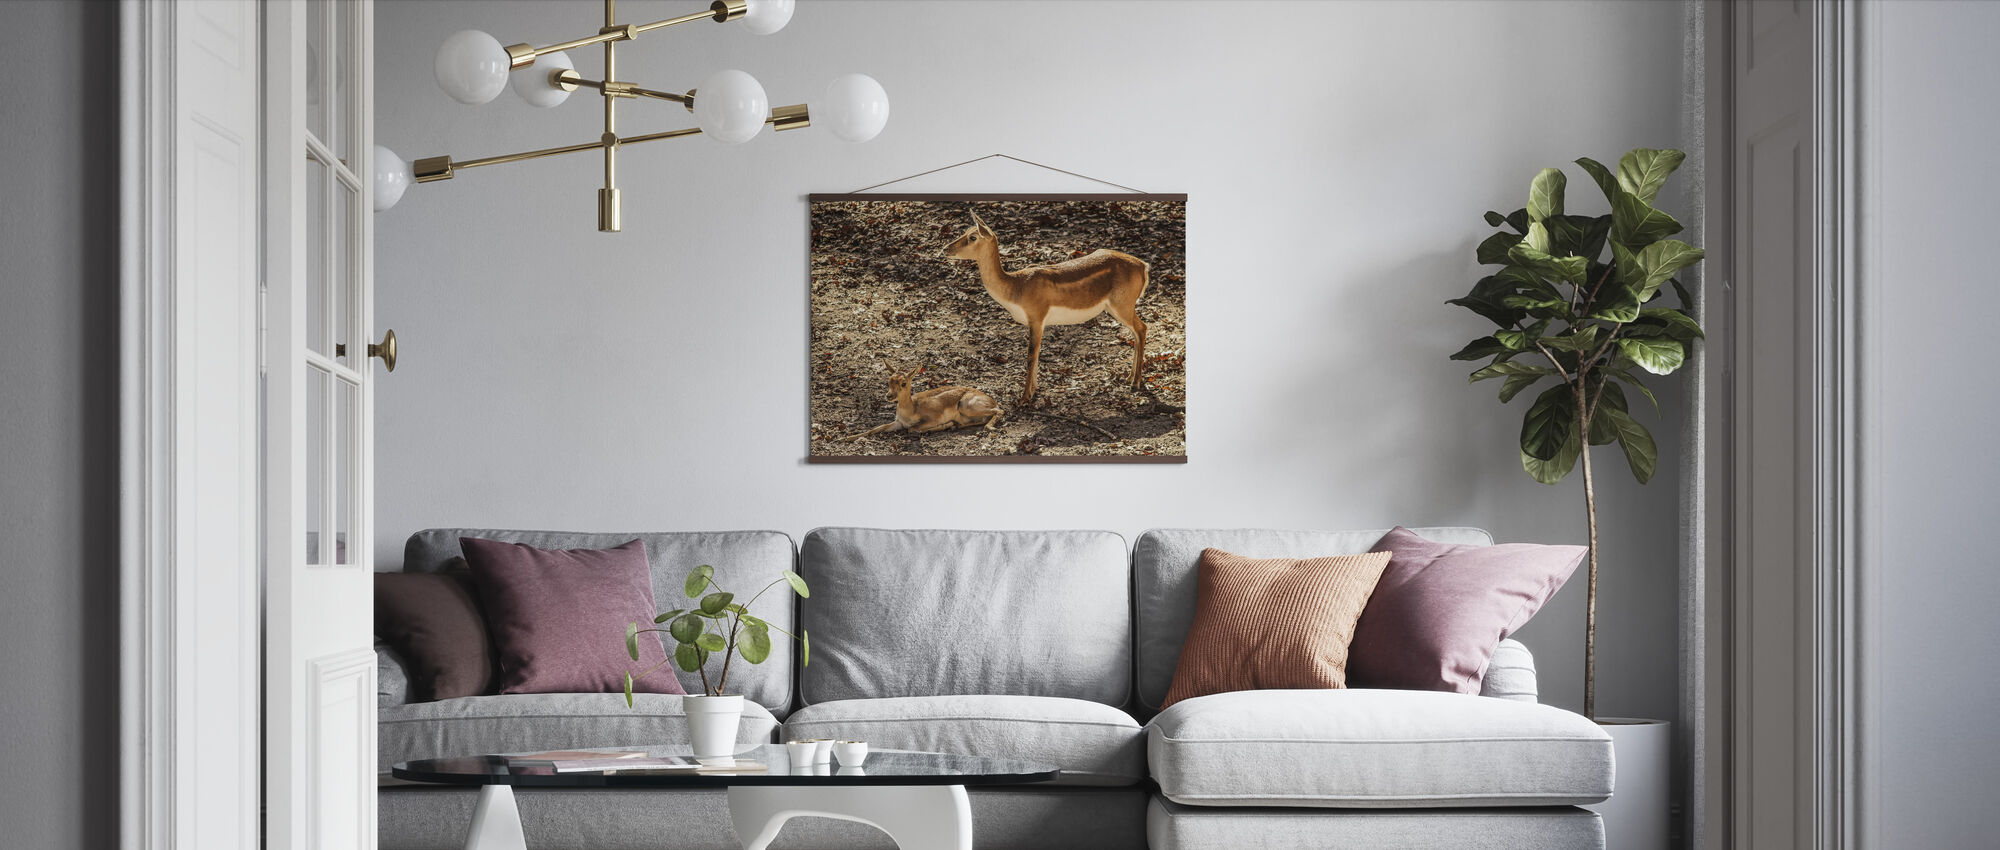 Gazelle Impala - Poster - Living Room